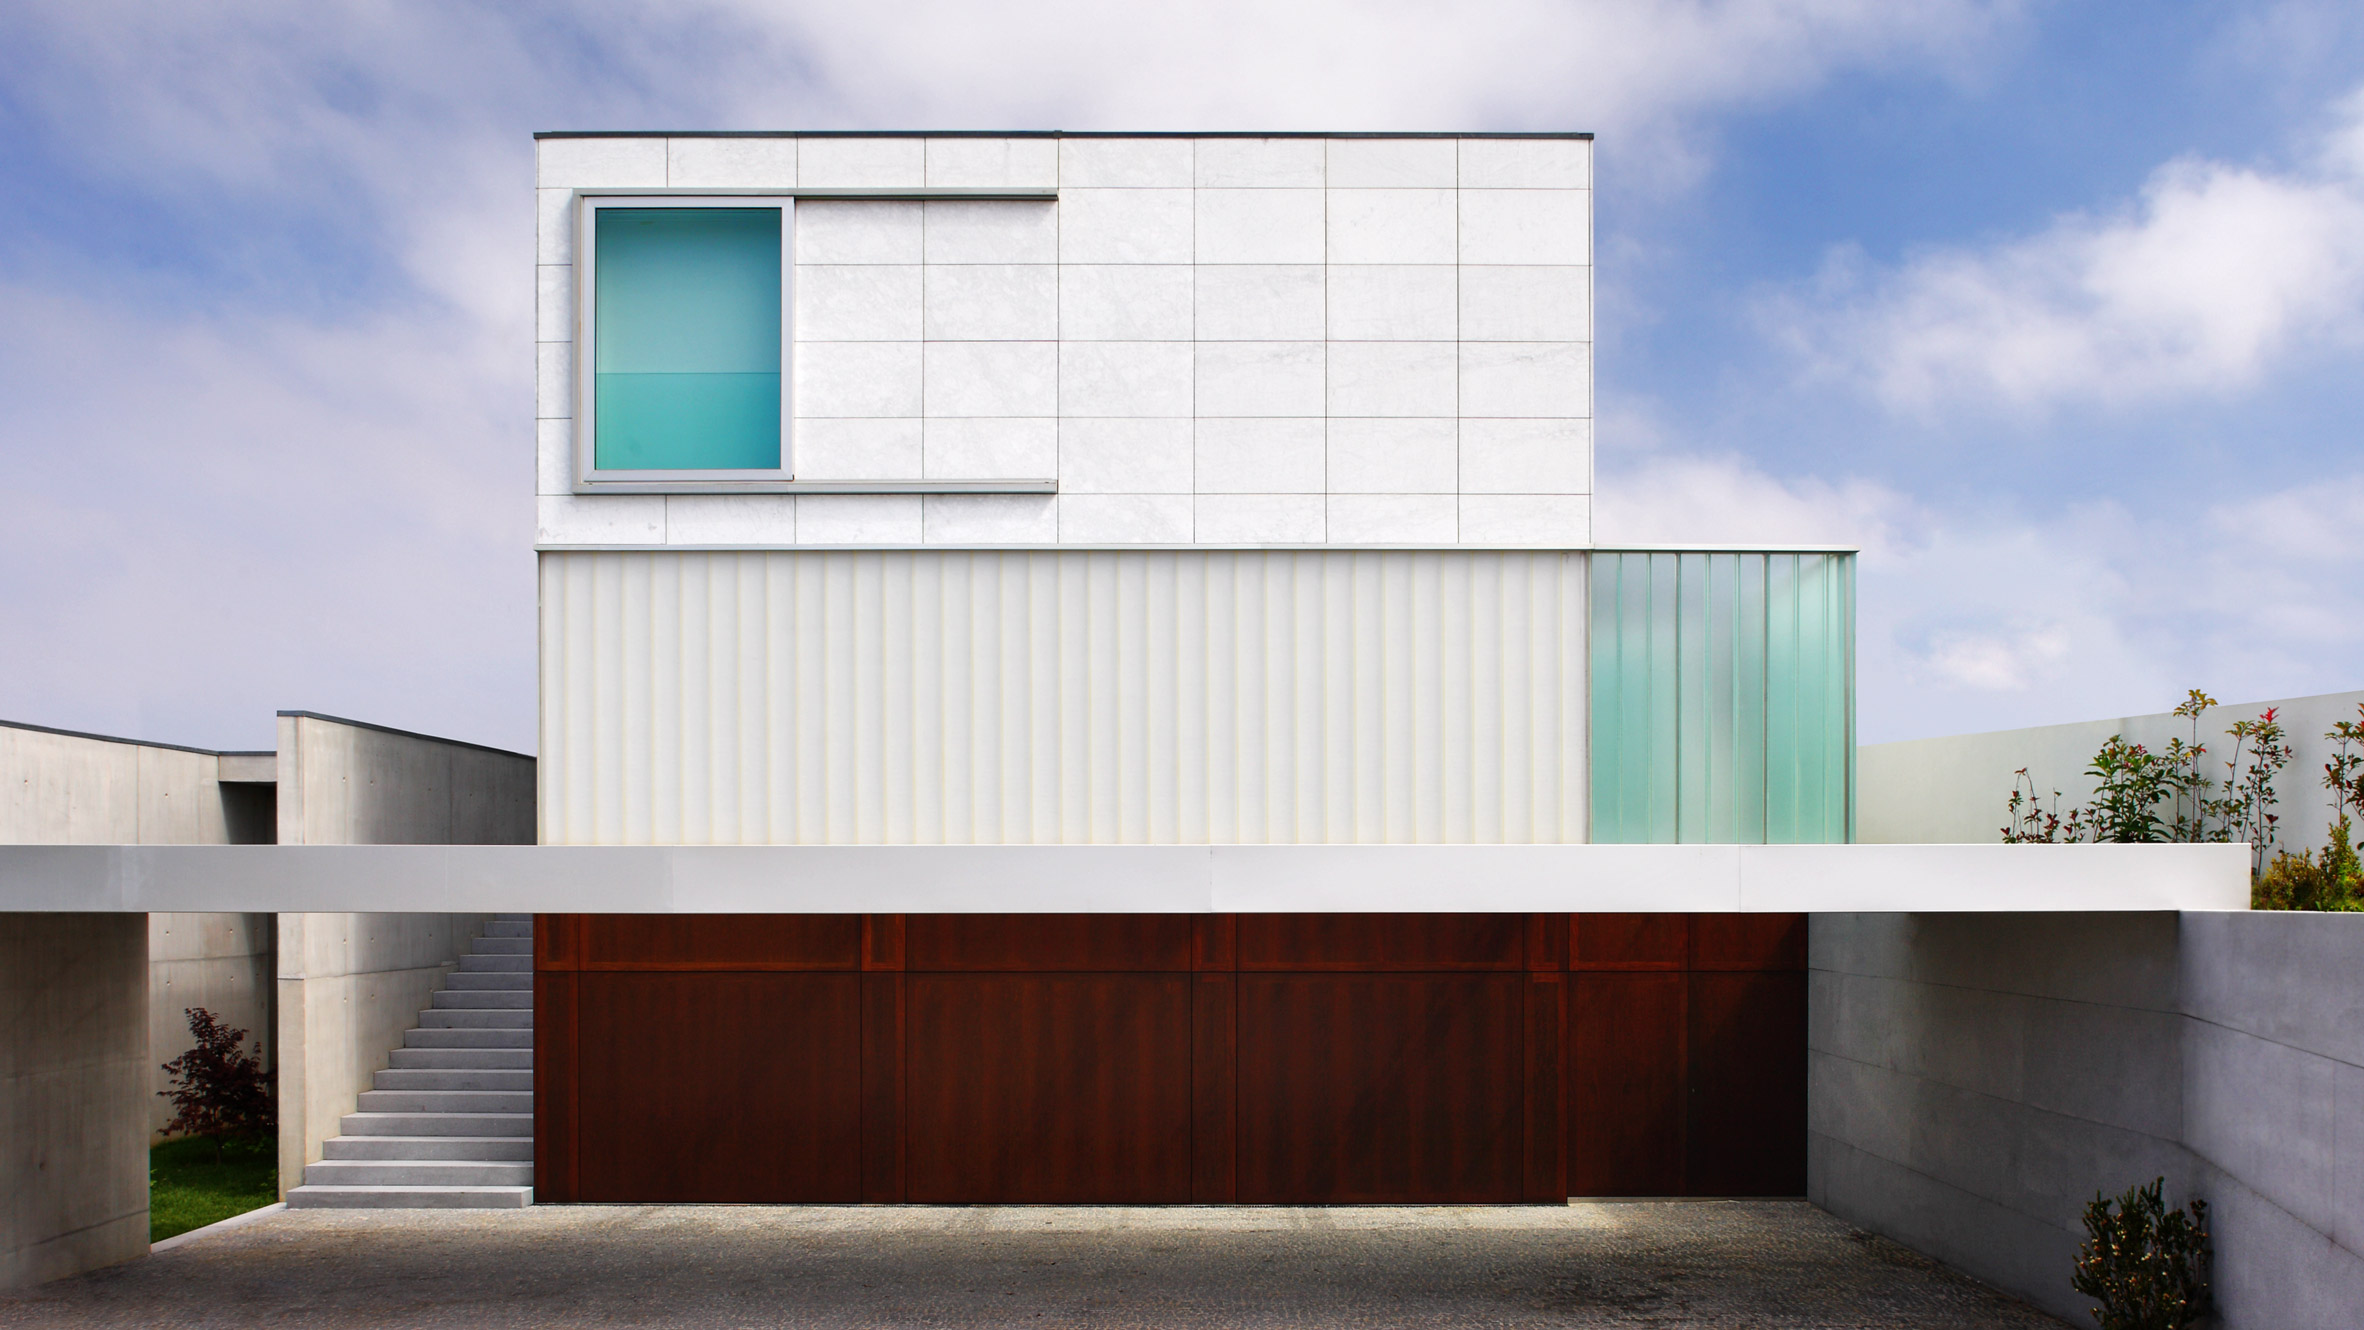 Seaside architecture and design | Dezeen